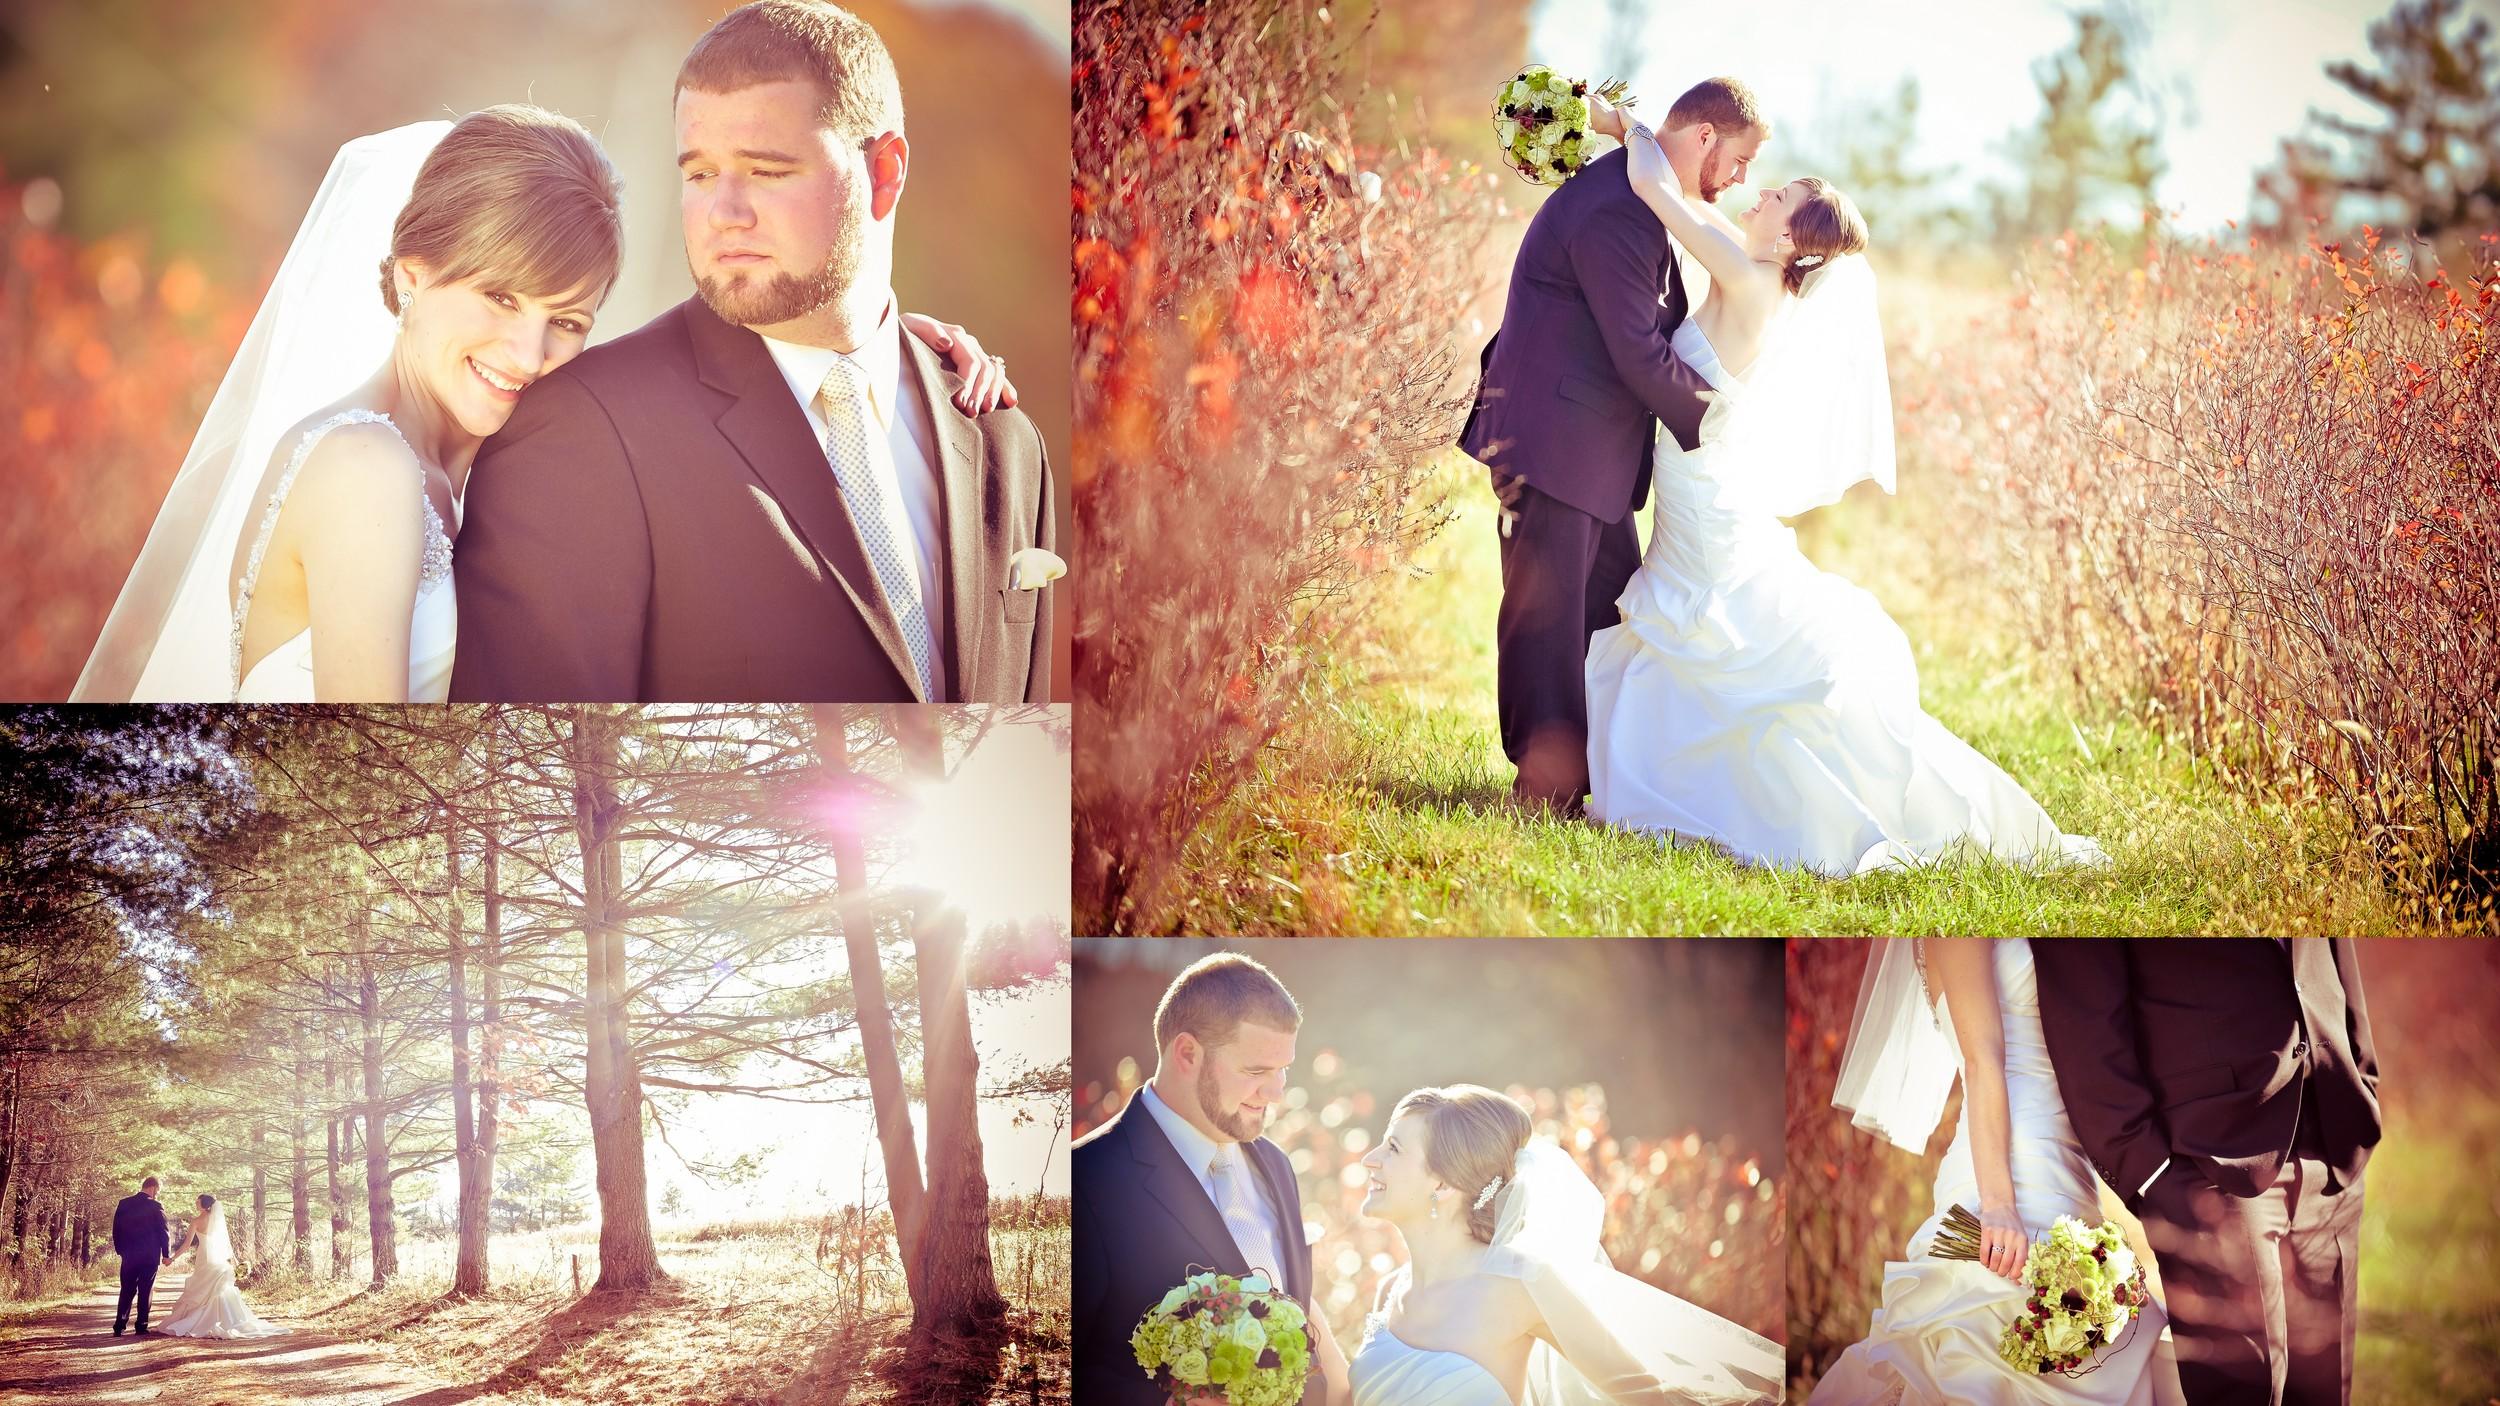 Kristin & Jeff 11-5-11.jpg